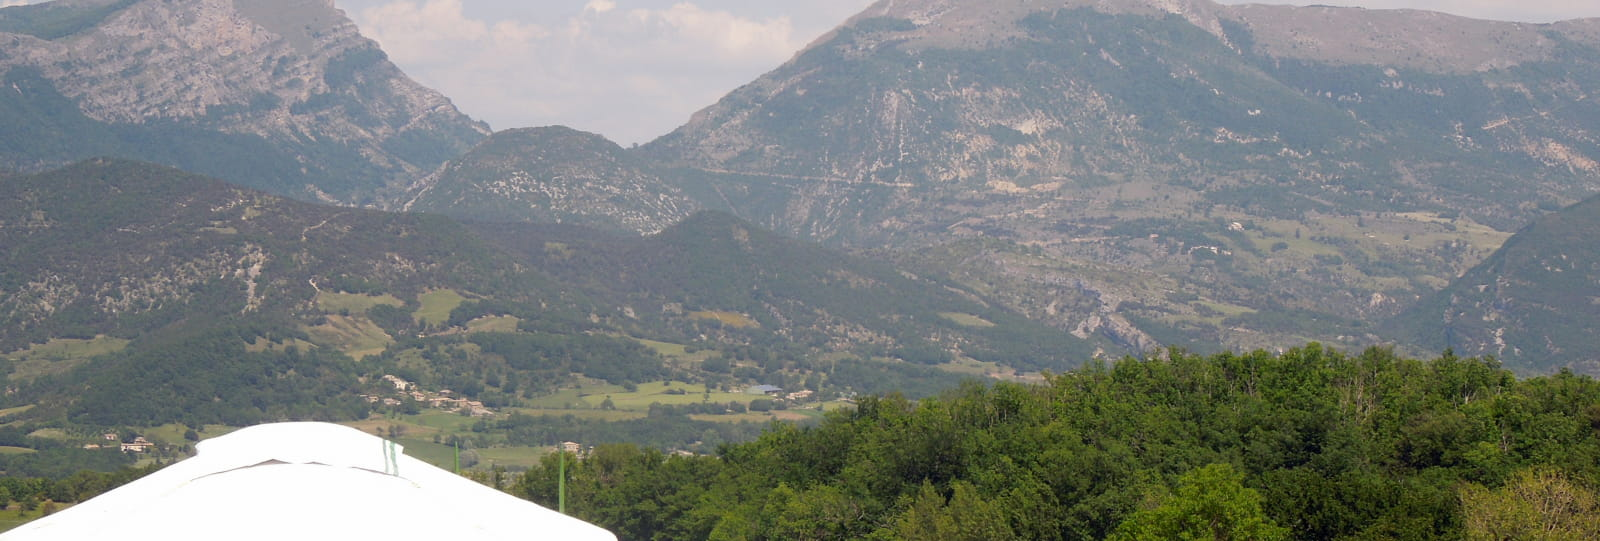 Drôme nomade